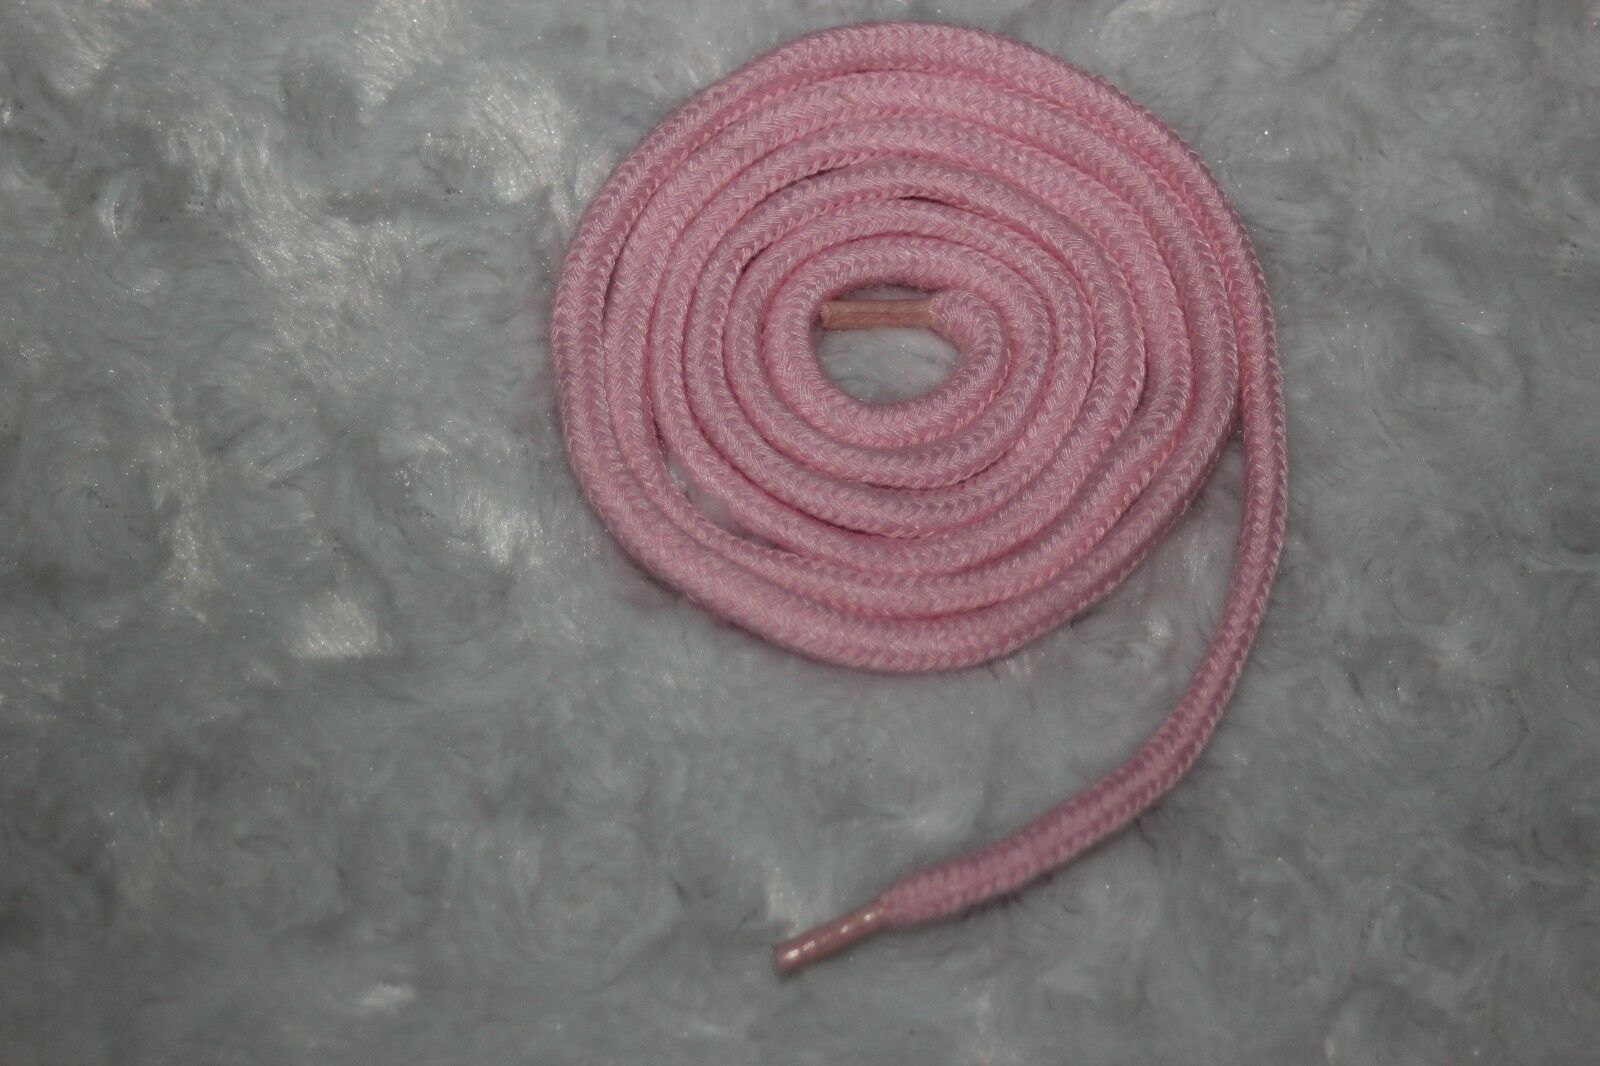 Replacement Drawstring White Red Black Gray plastic Tip Hoodies Sweatpants Bags